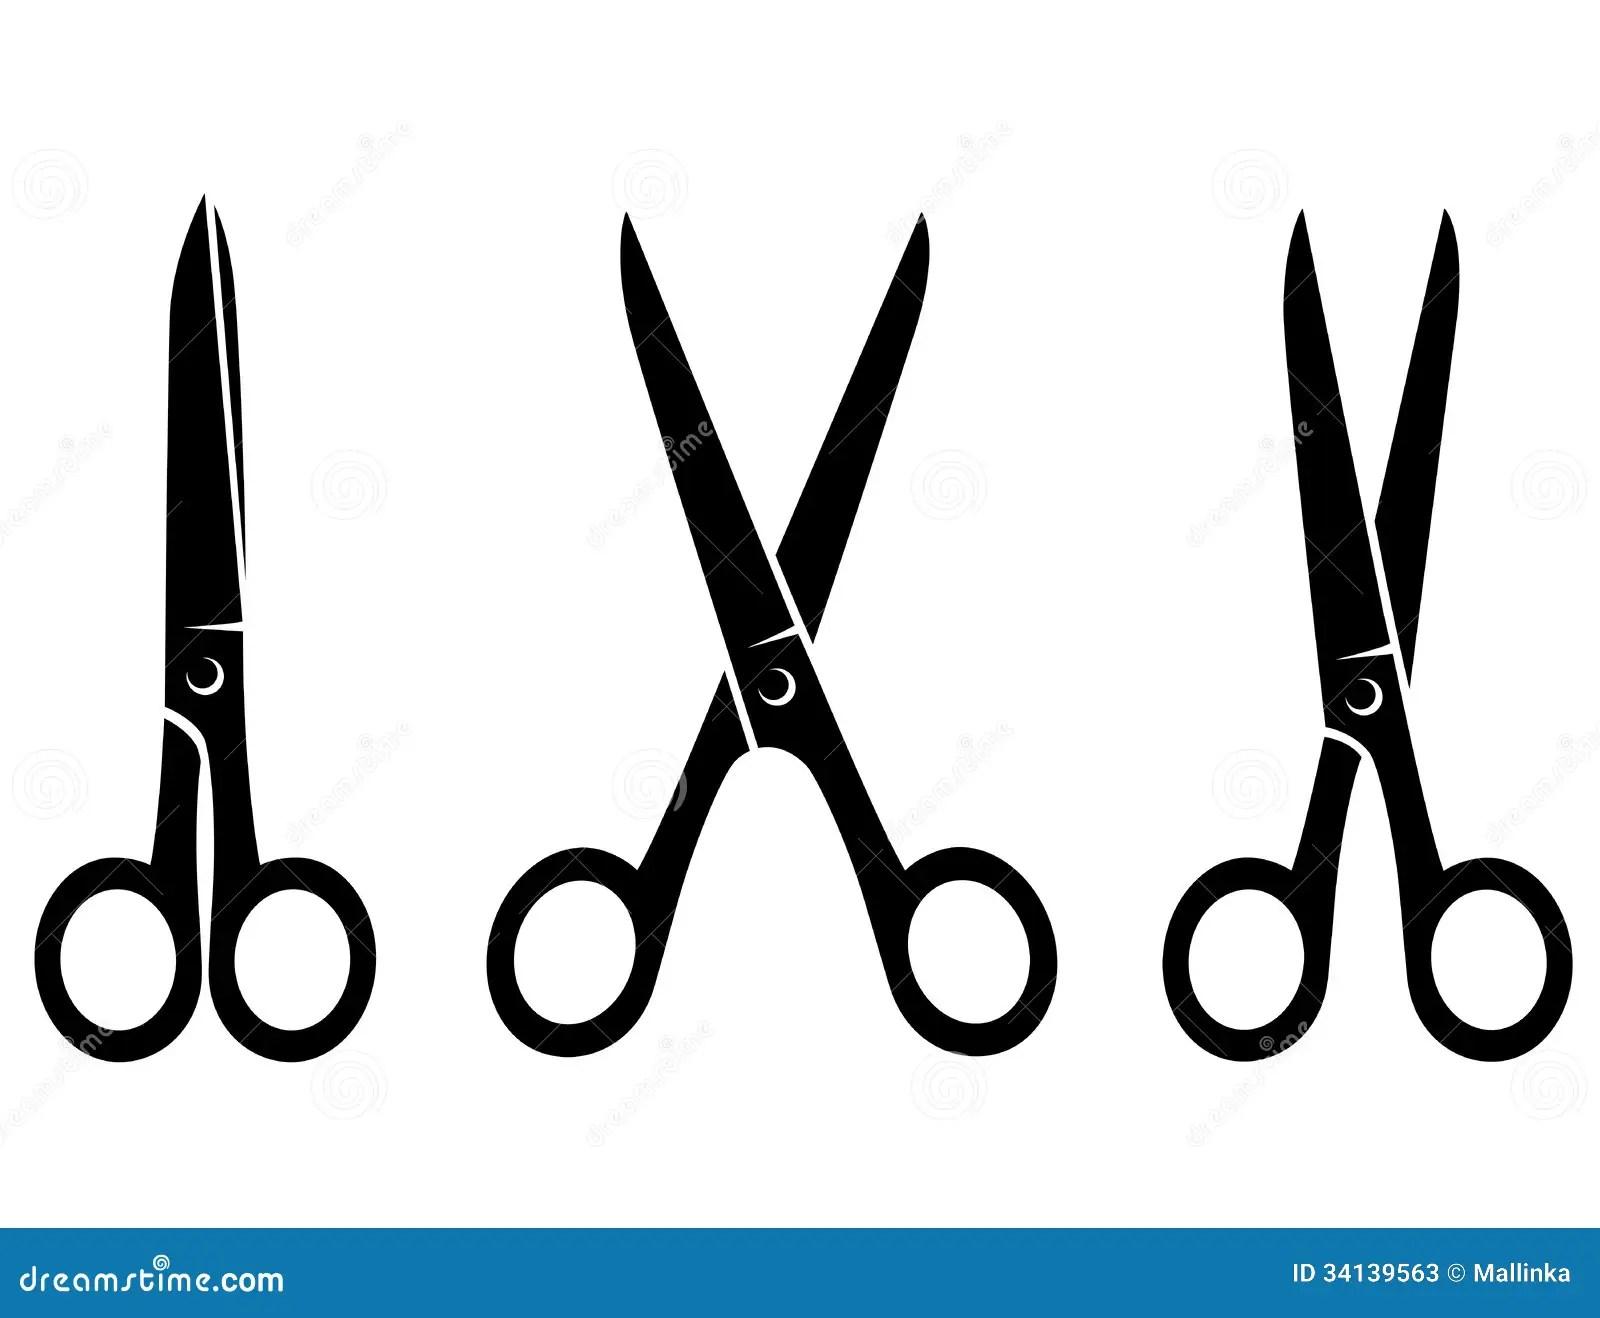 Isolated Black Scissors On White Background Stock Vector